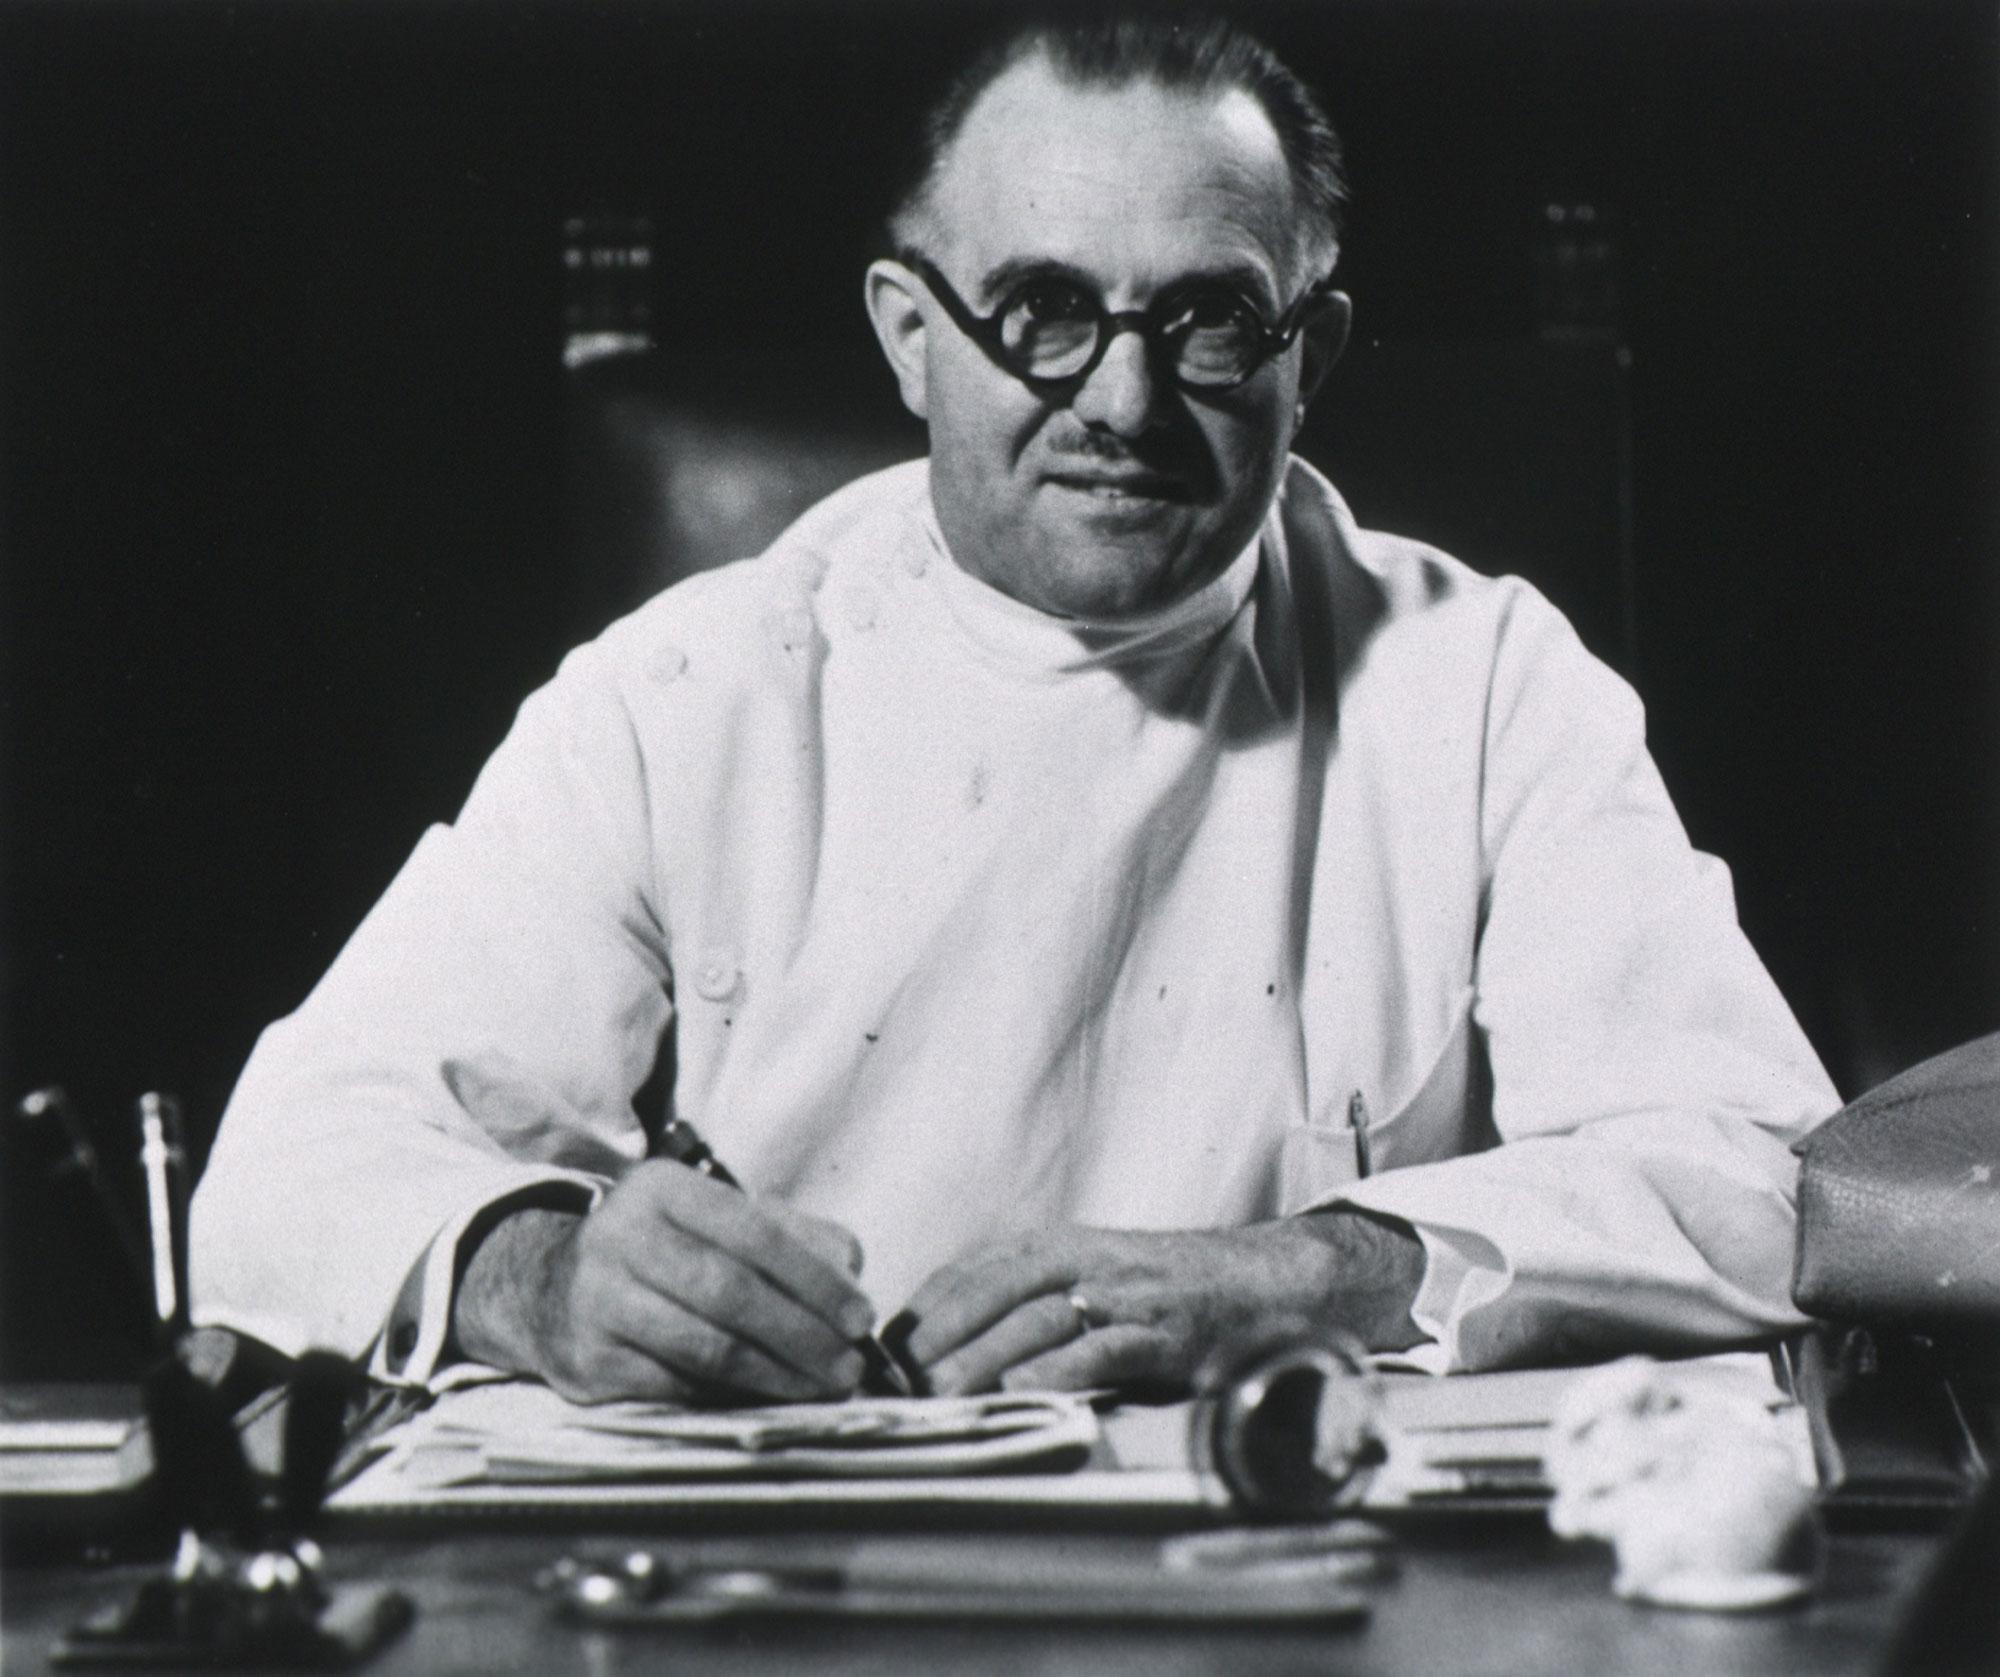 Joseph Maisin